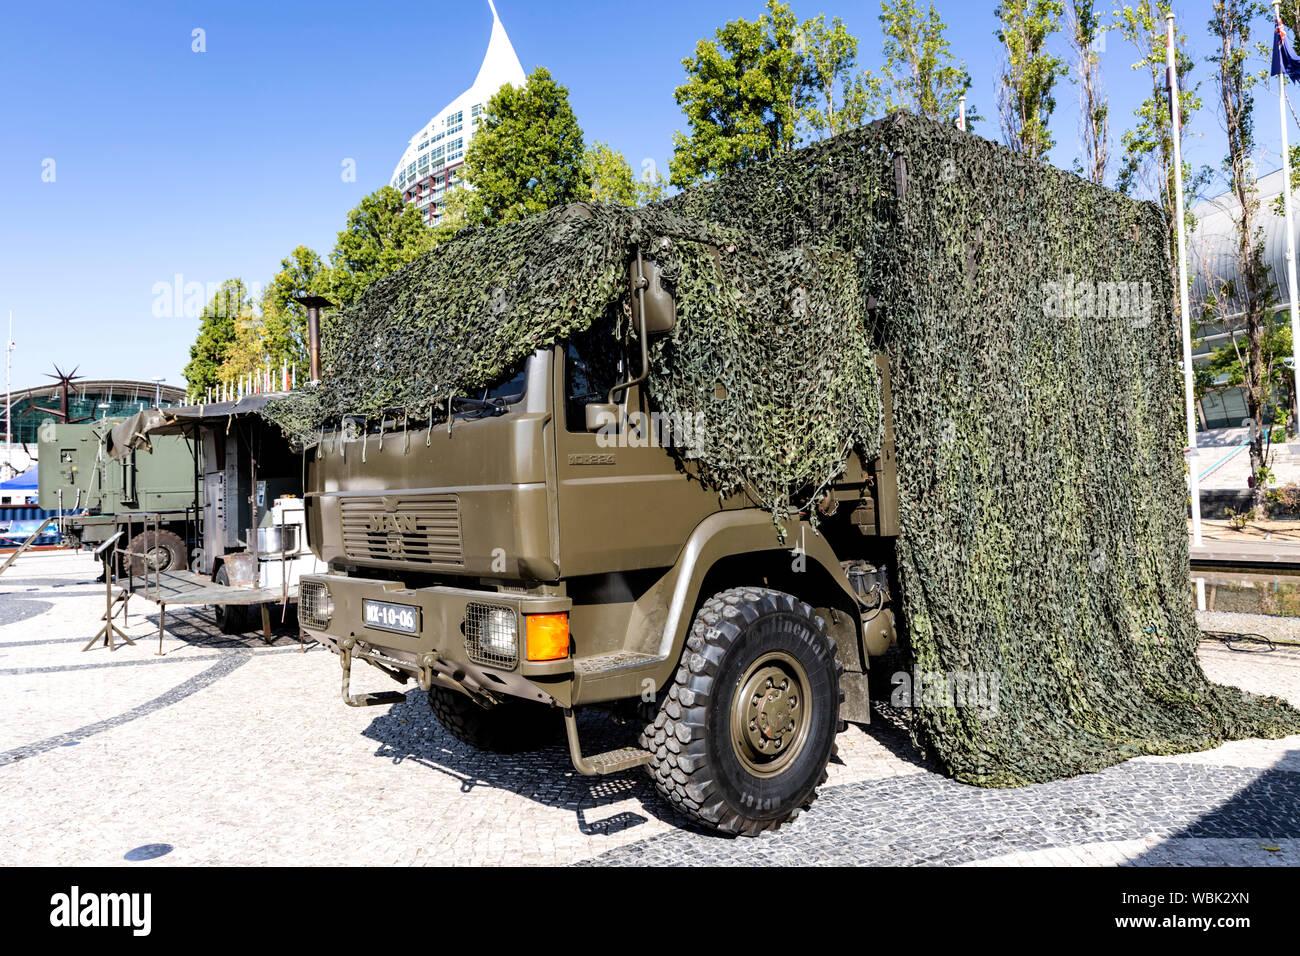 Army Camo Netting Stock Photos & Army Camo Netting Stock